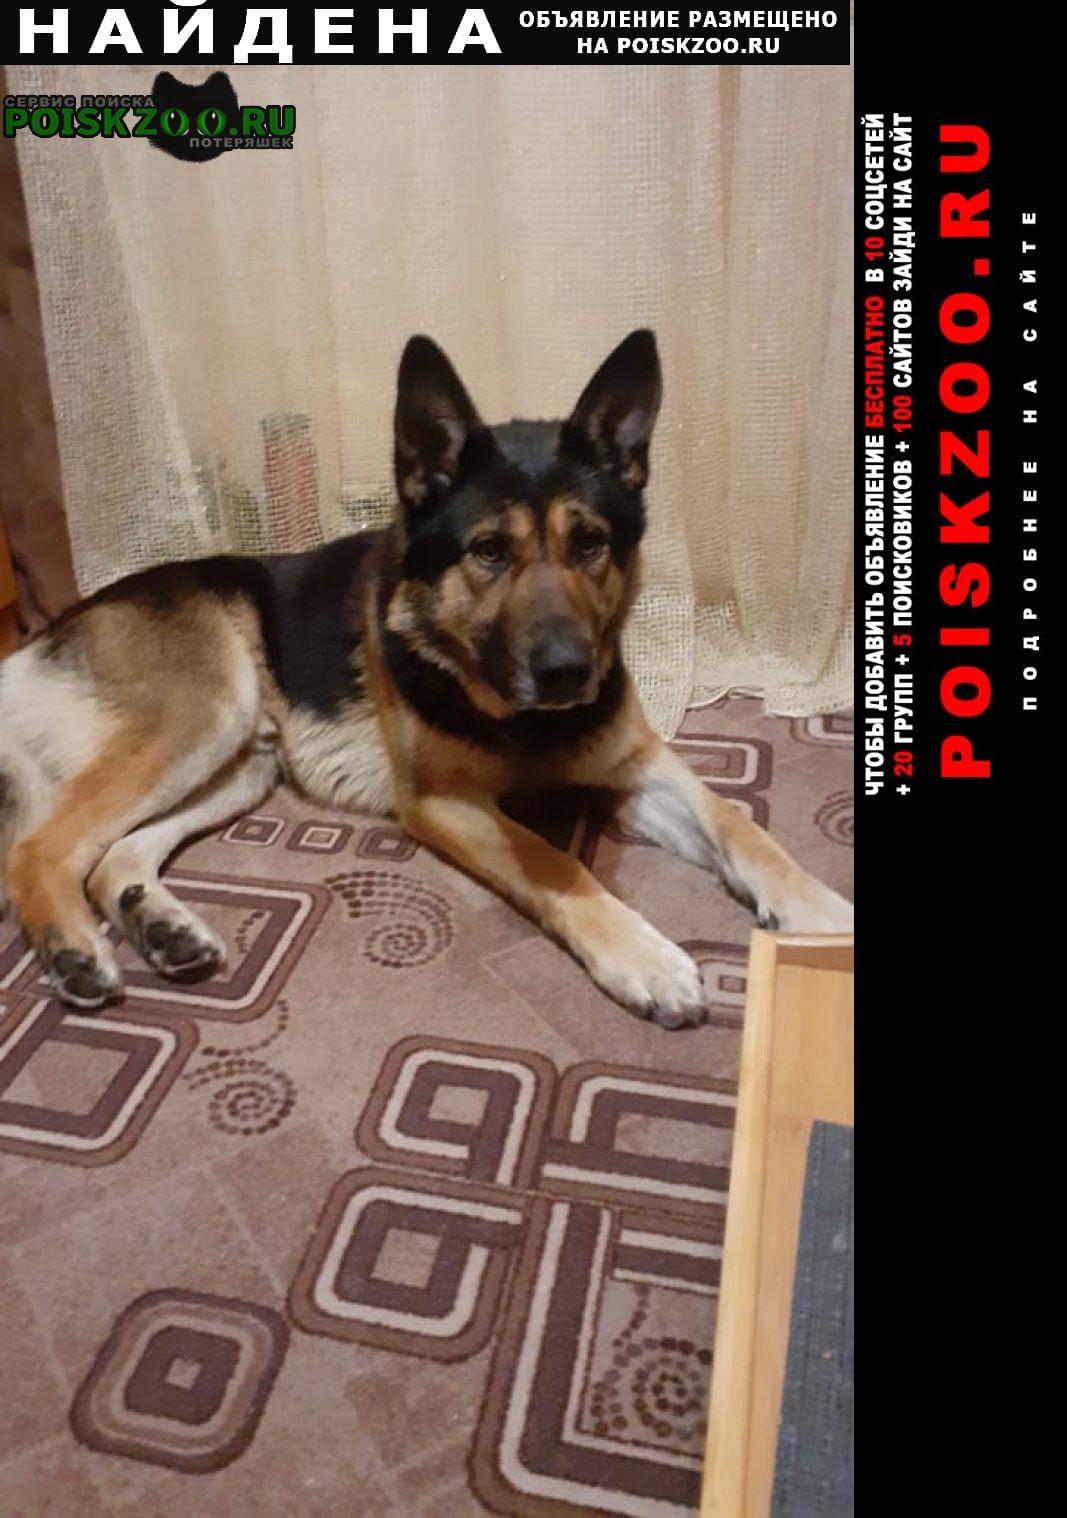 Найдена собака овчарка кабель с ошейником Шатура